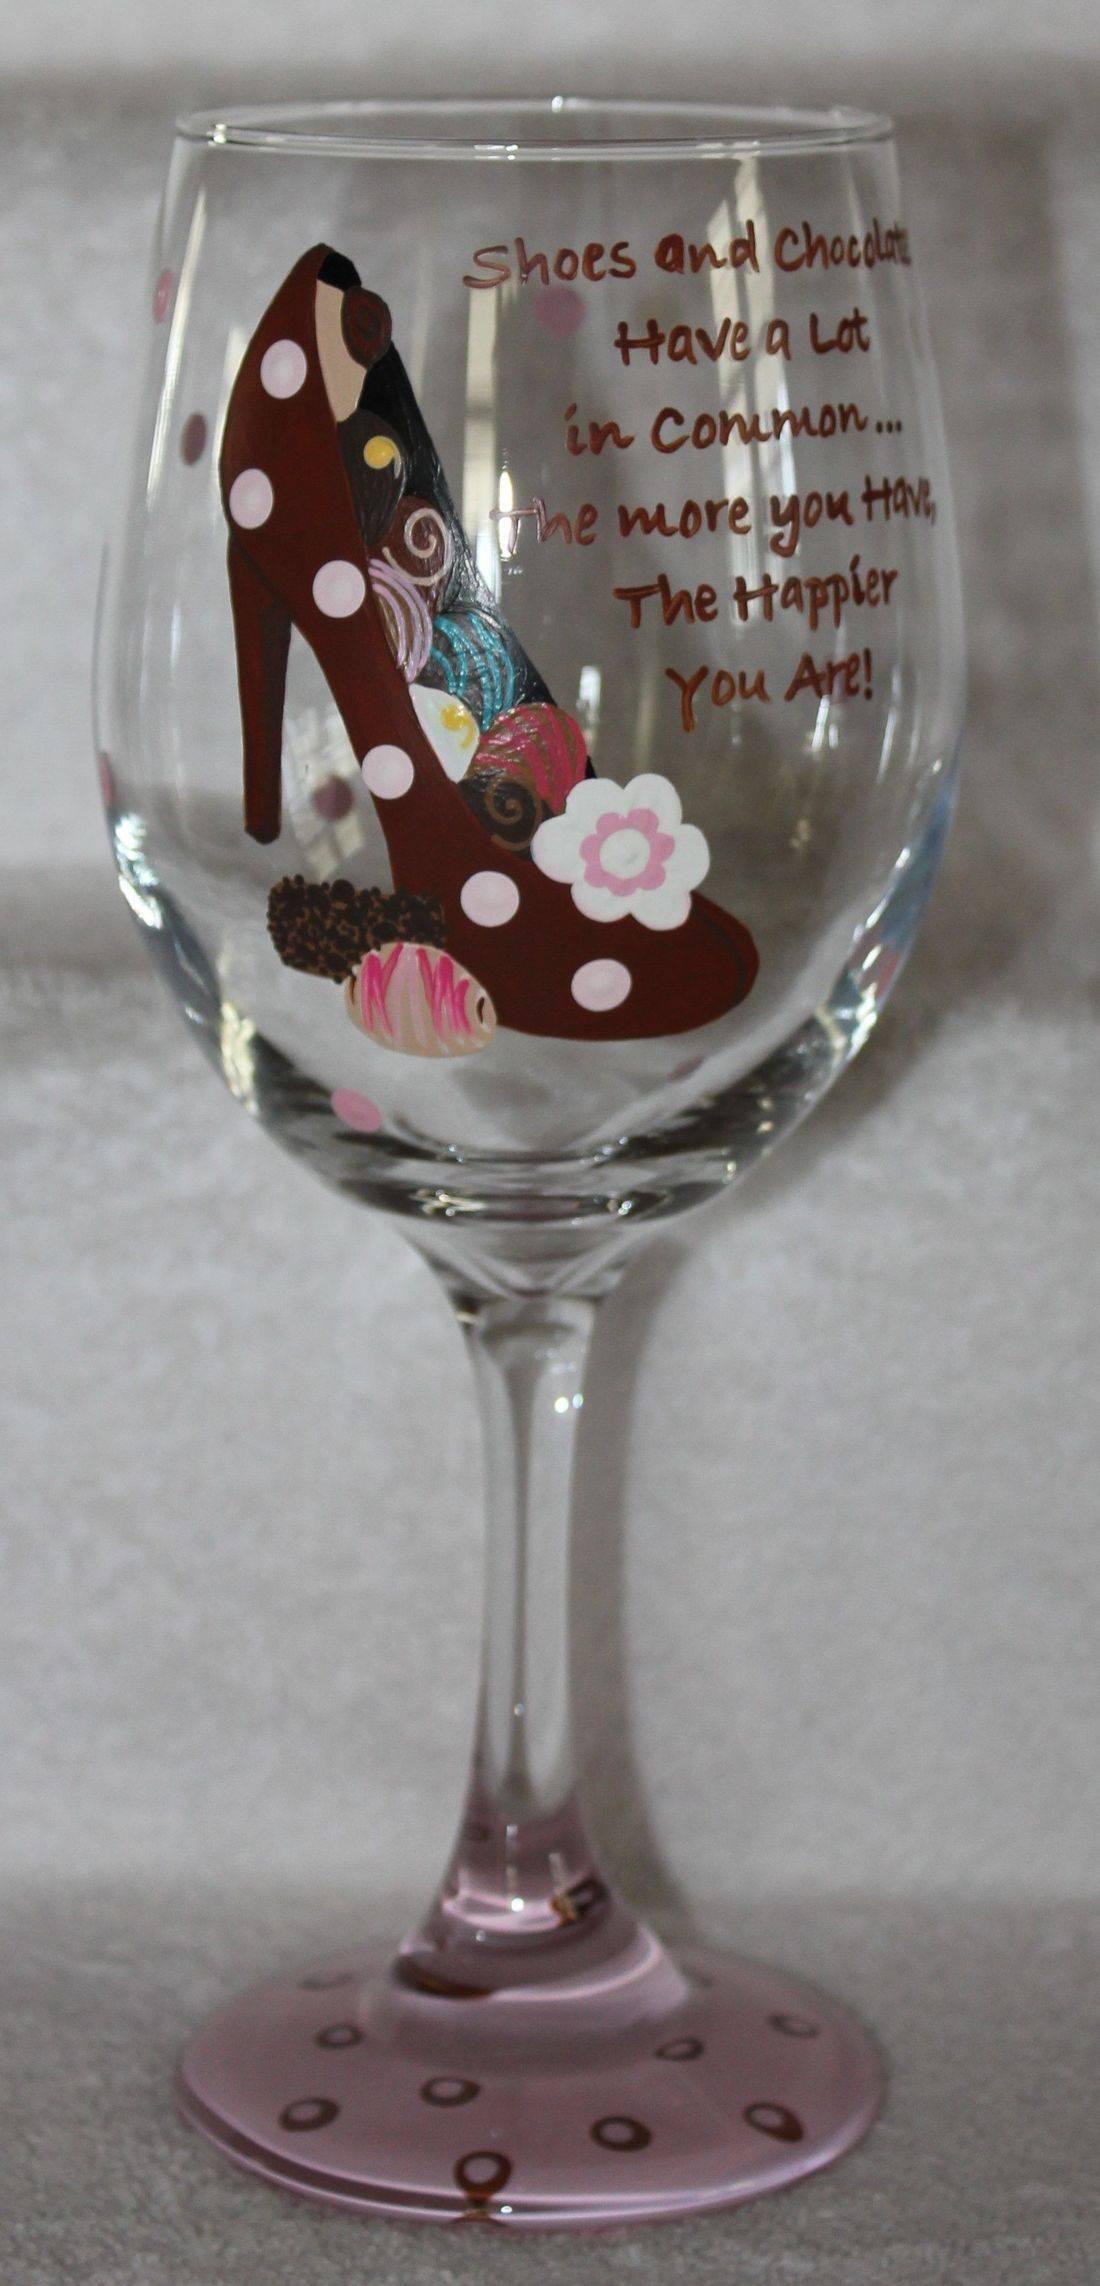 chocolate wine glass, shoe wine glass, chocolate glass, shoe glass